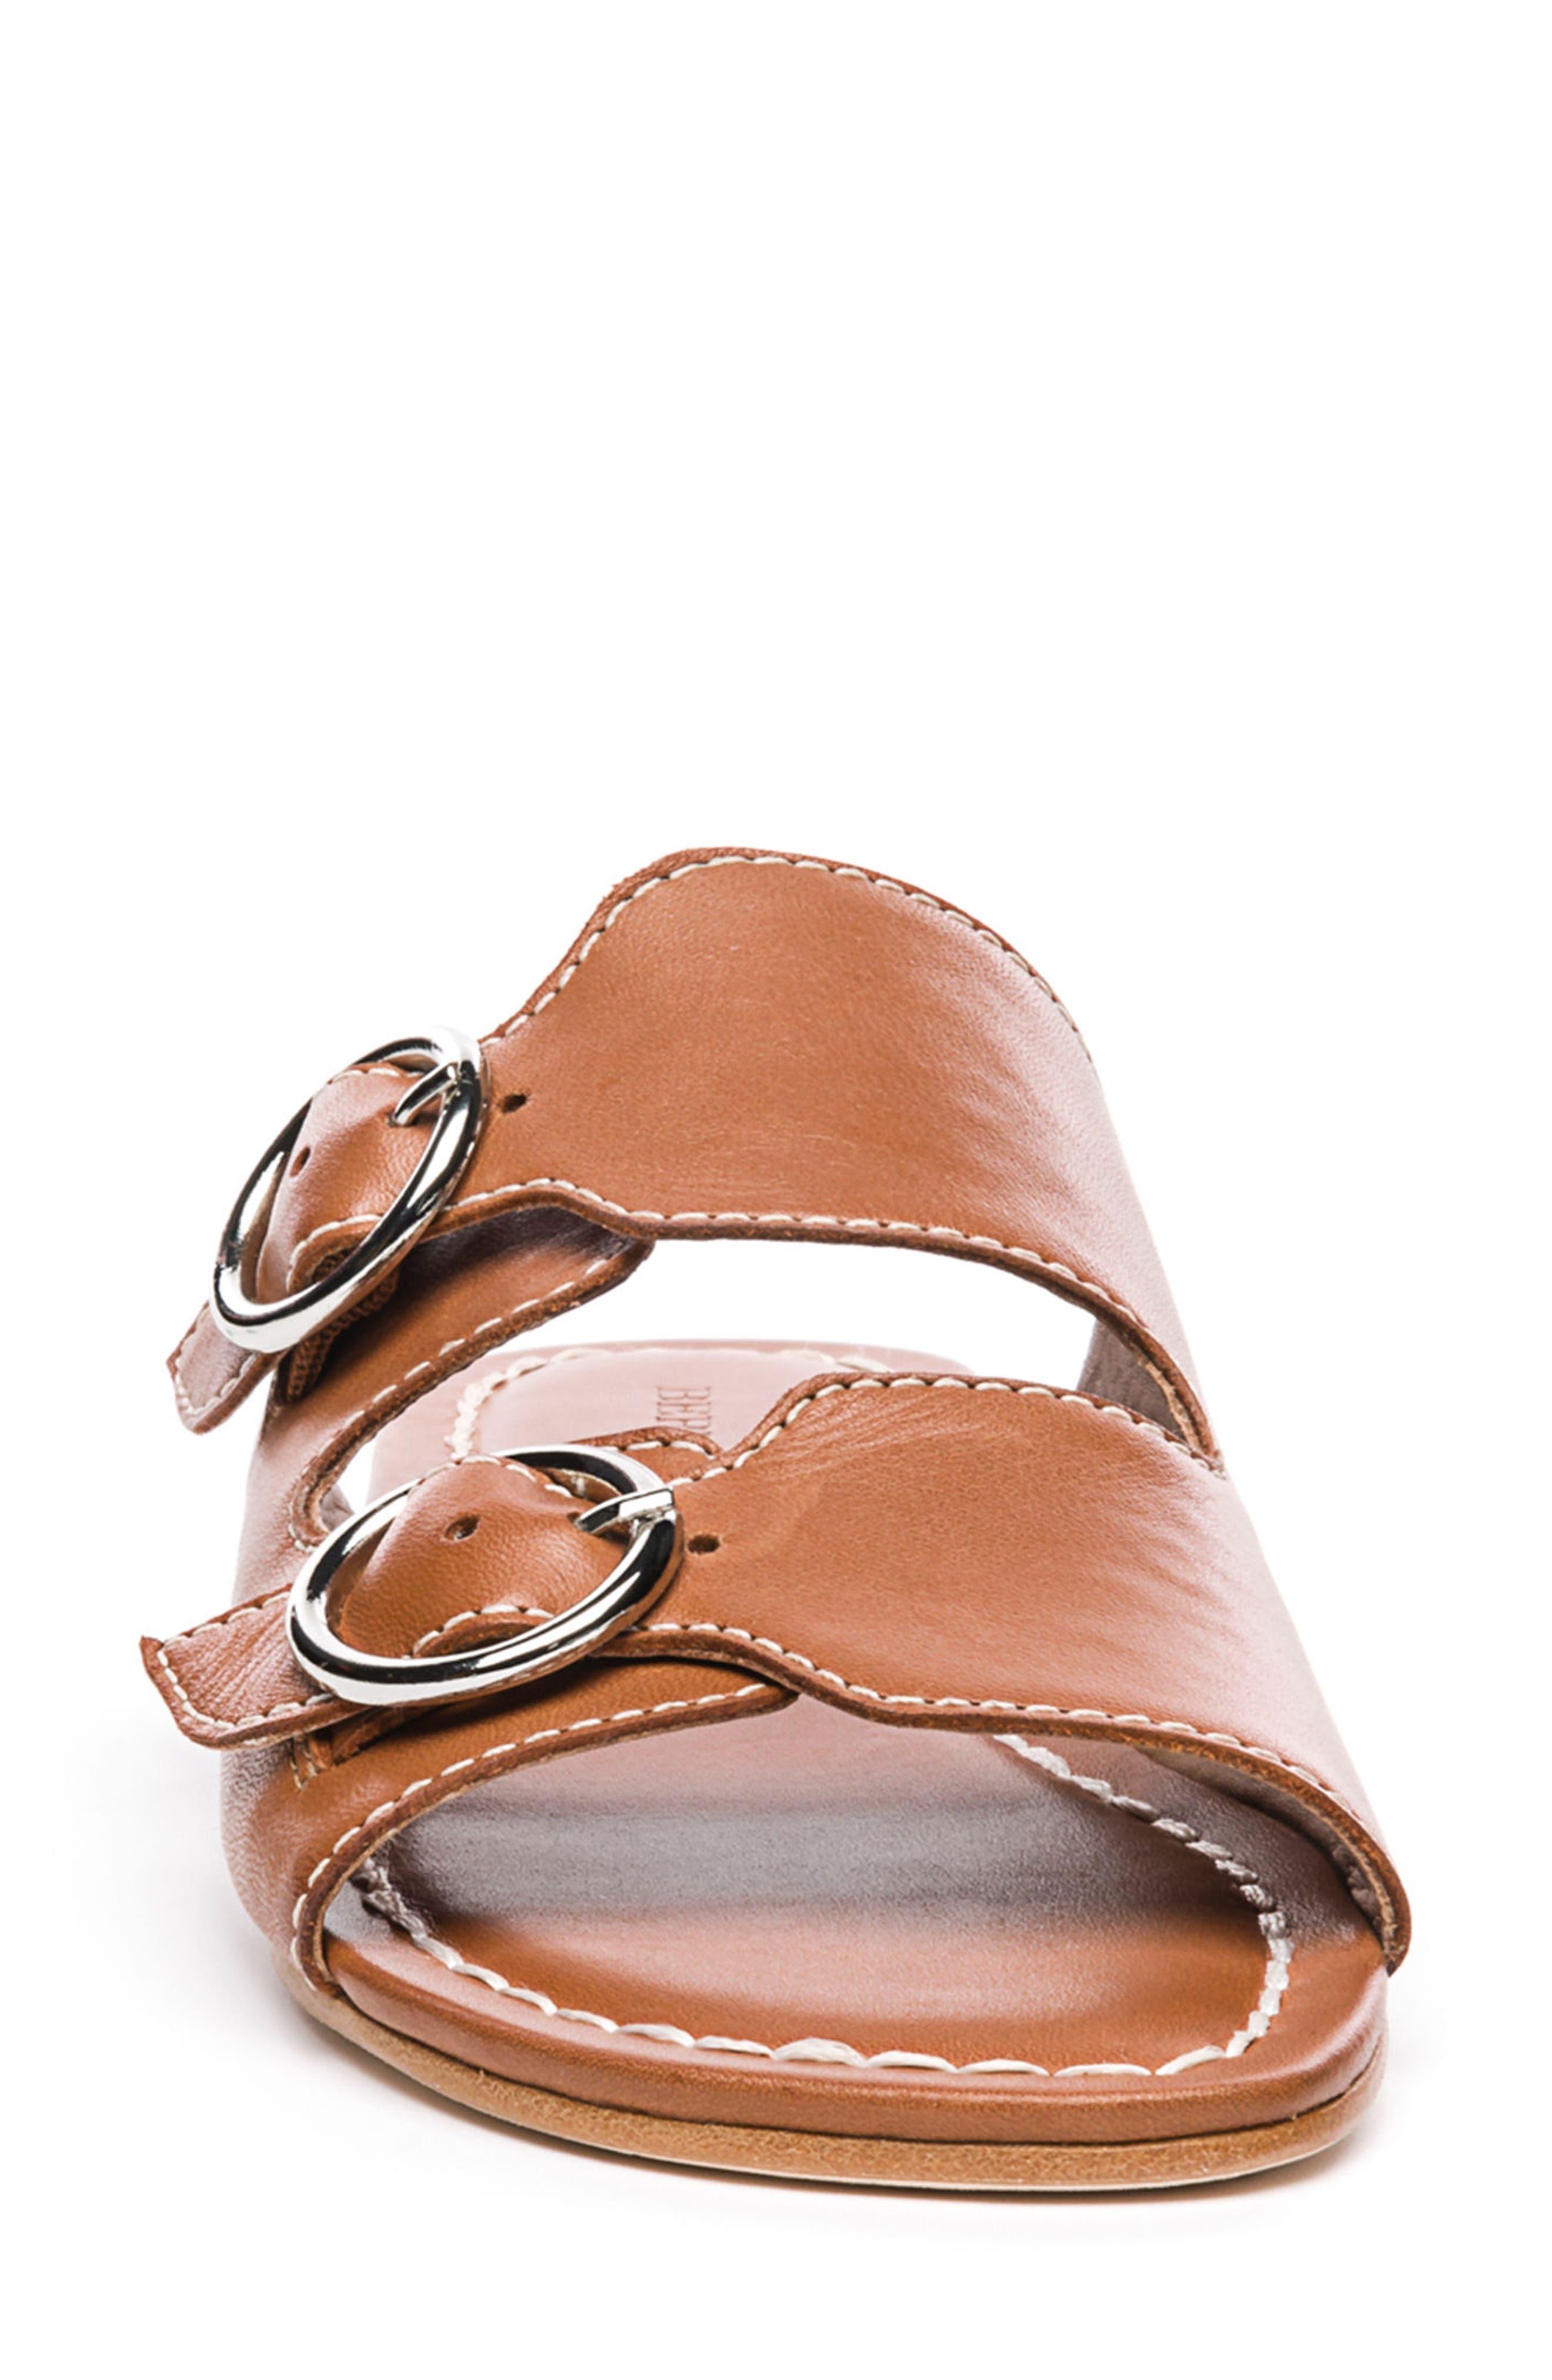 Bernardo Tobi Slide Sandal,                             Alternate thumbnail 4, color,                             Luggage Leather